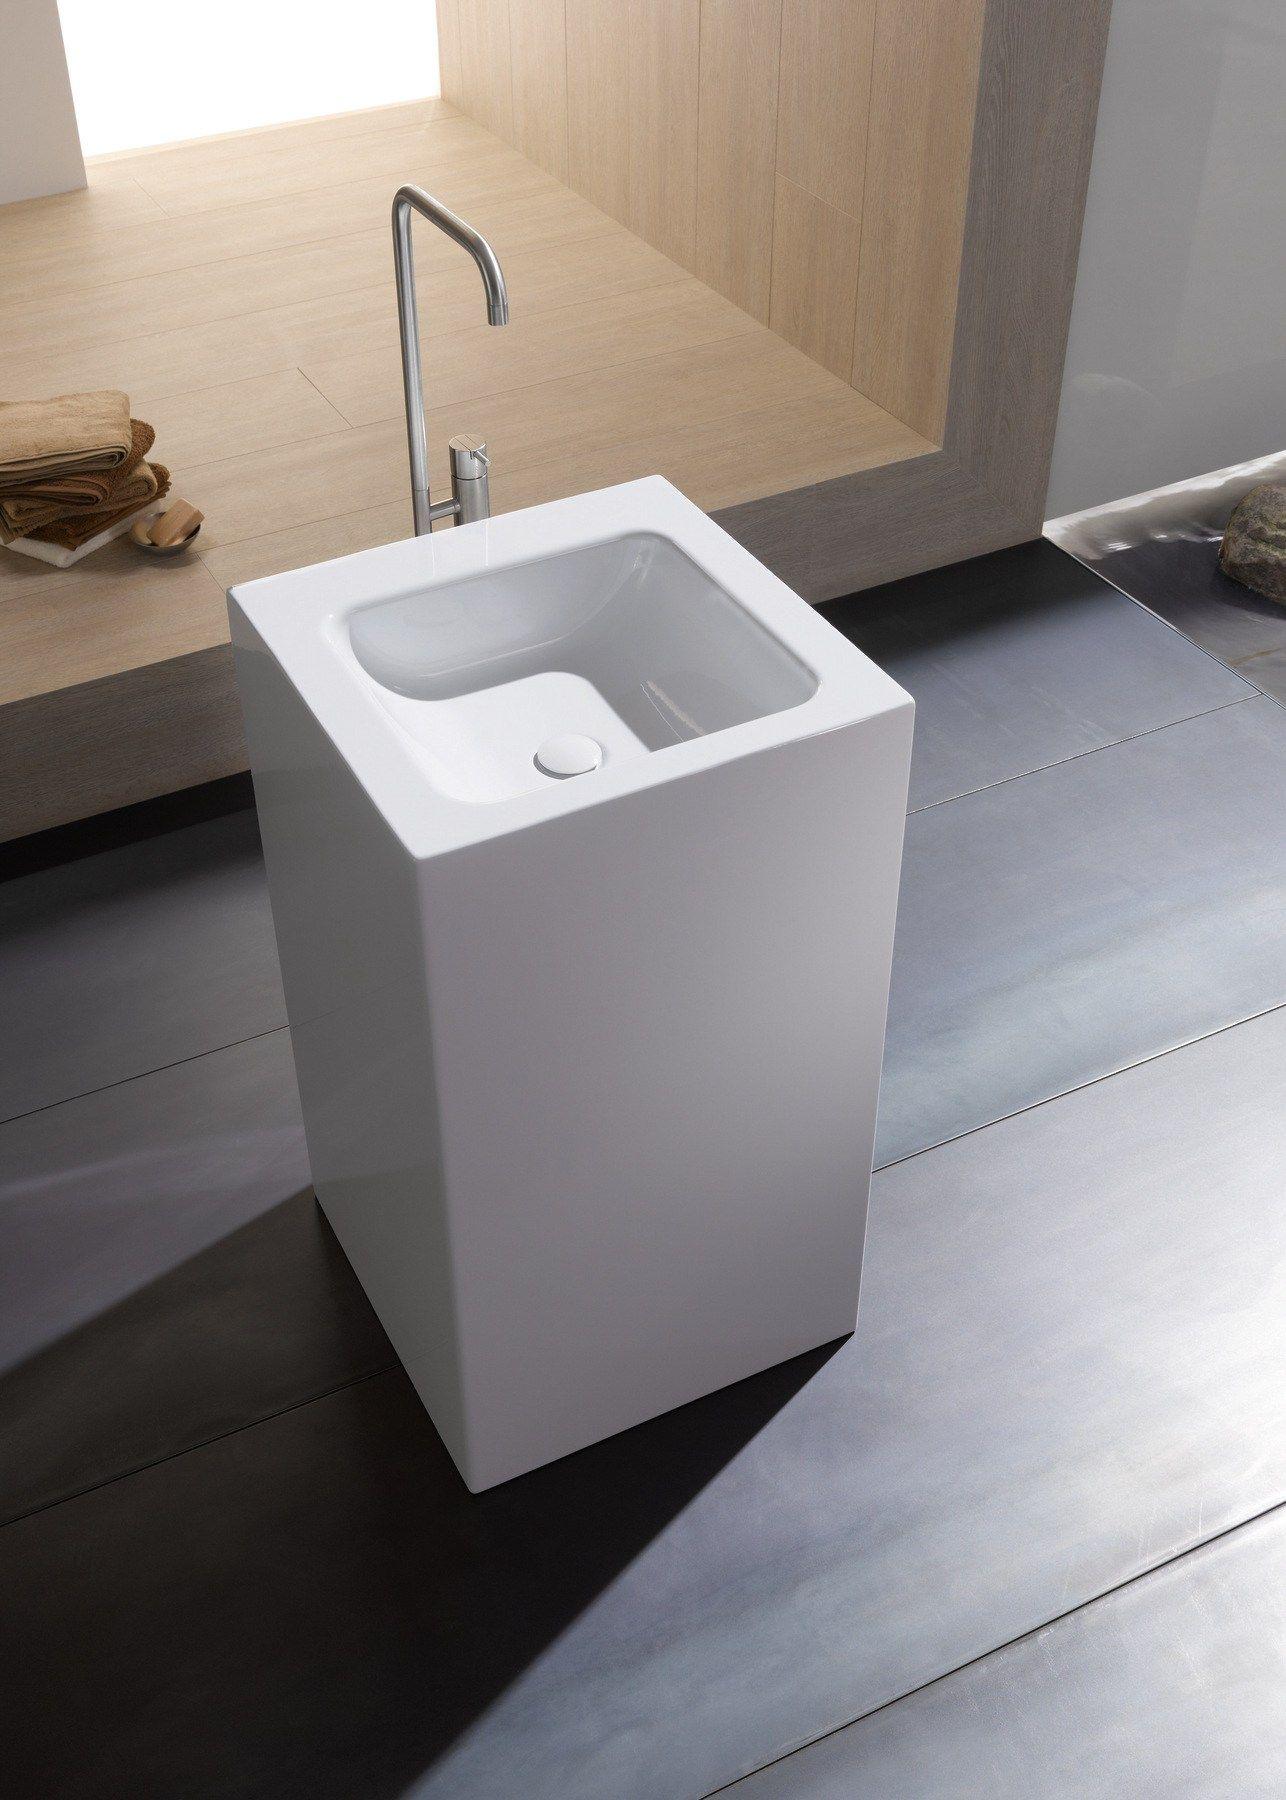 lavabo sur pied carr simple betteone monolith by bette. Black Bedroom Furniture Sets. Home Design Ideas